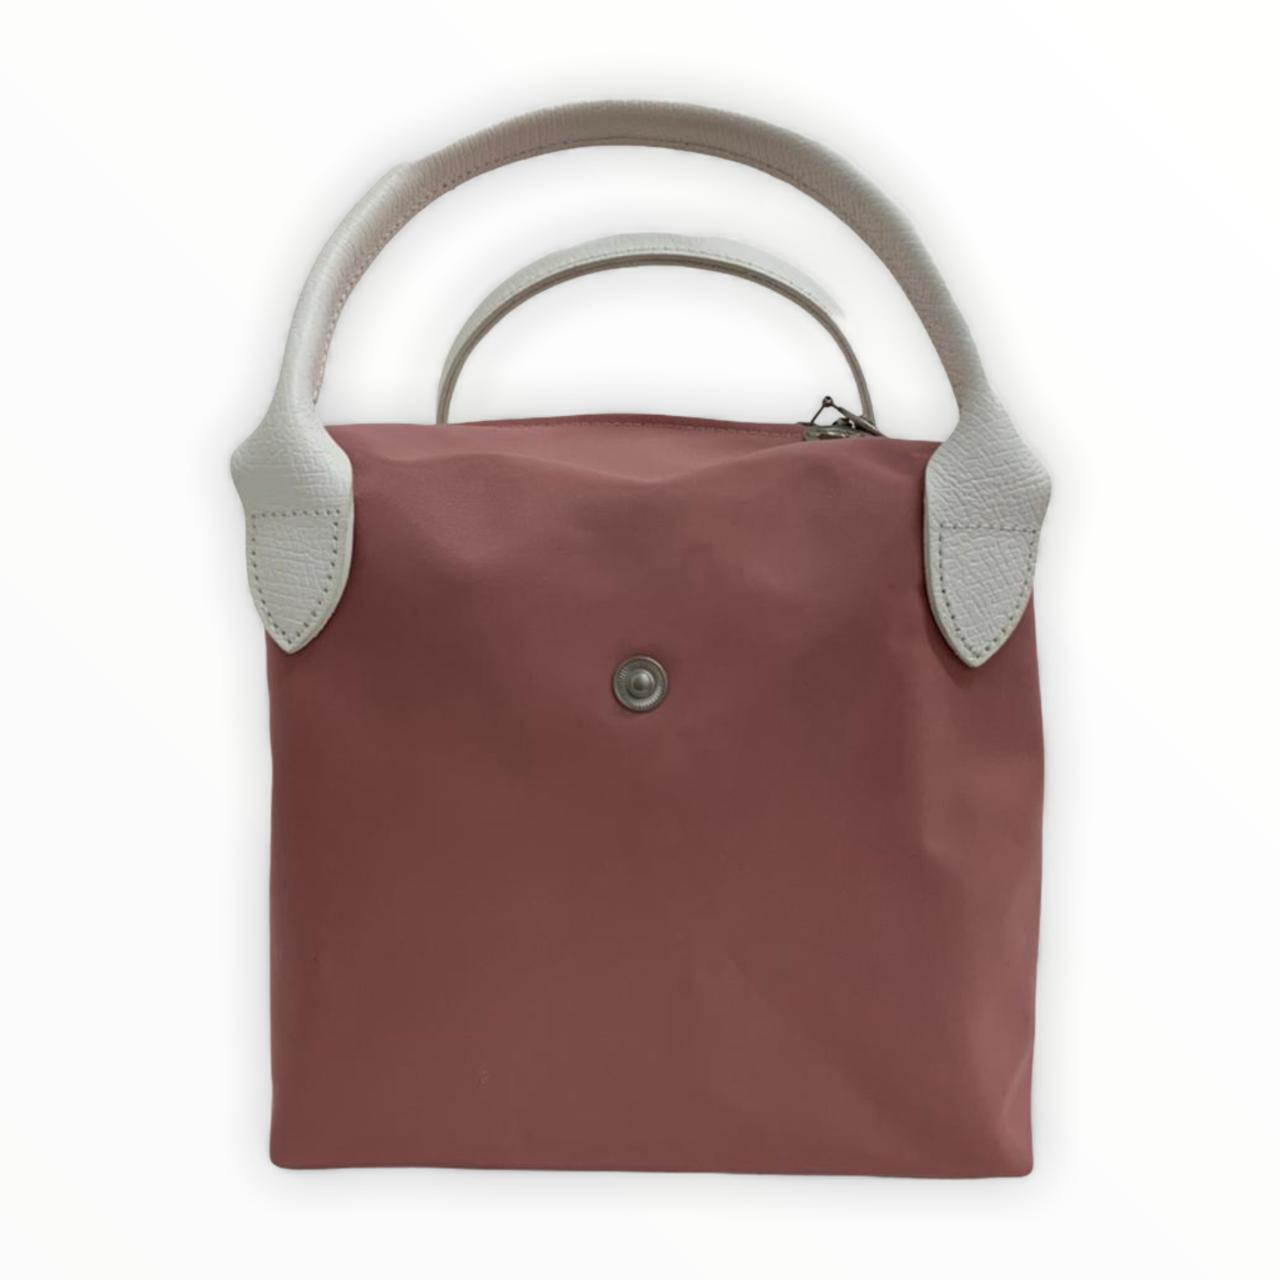 Bolsa Longchamp 'Longchamp x Nendo' Version